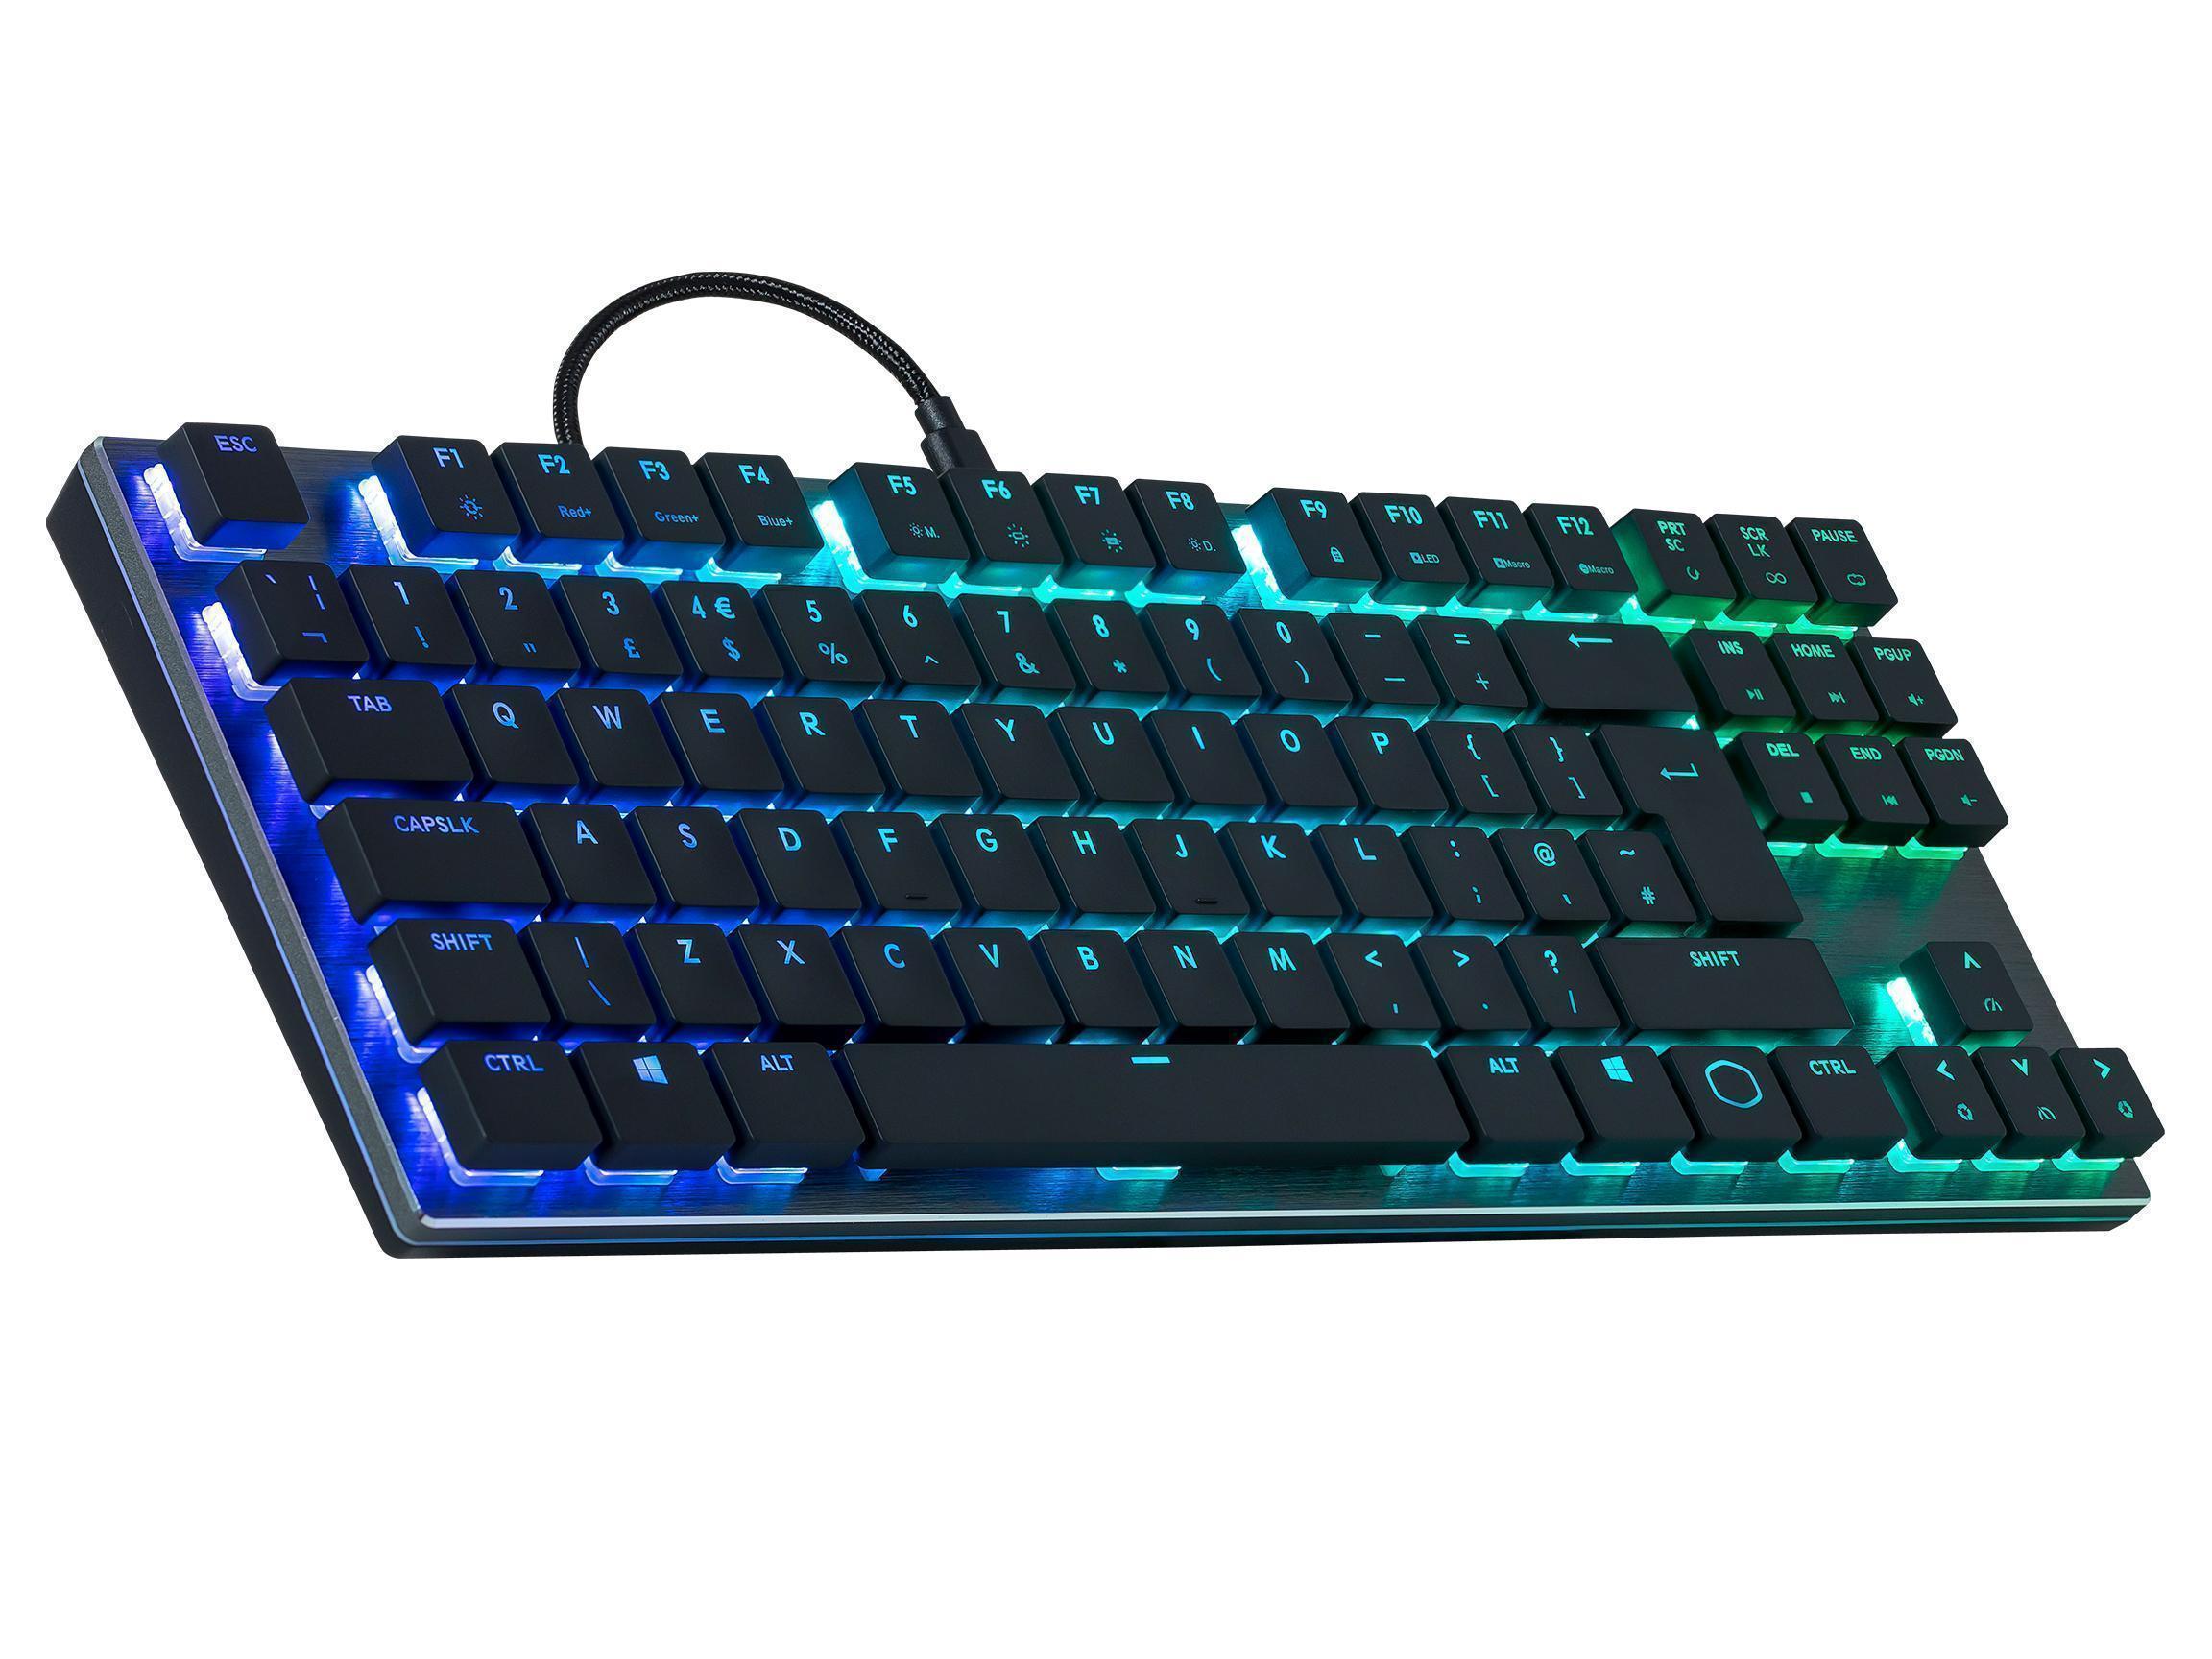 Cooler Master SK630 Mechanical Gaming Keyboard